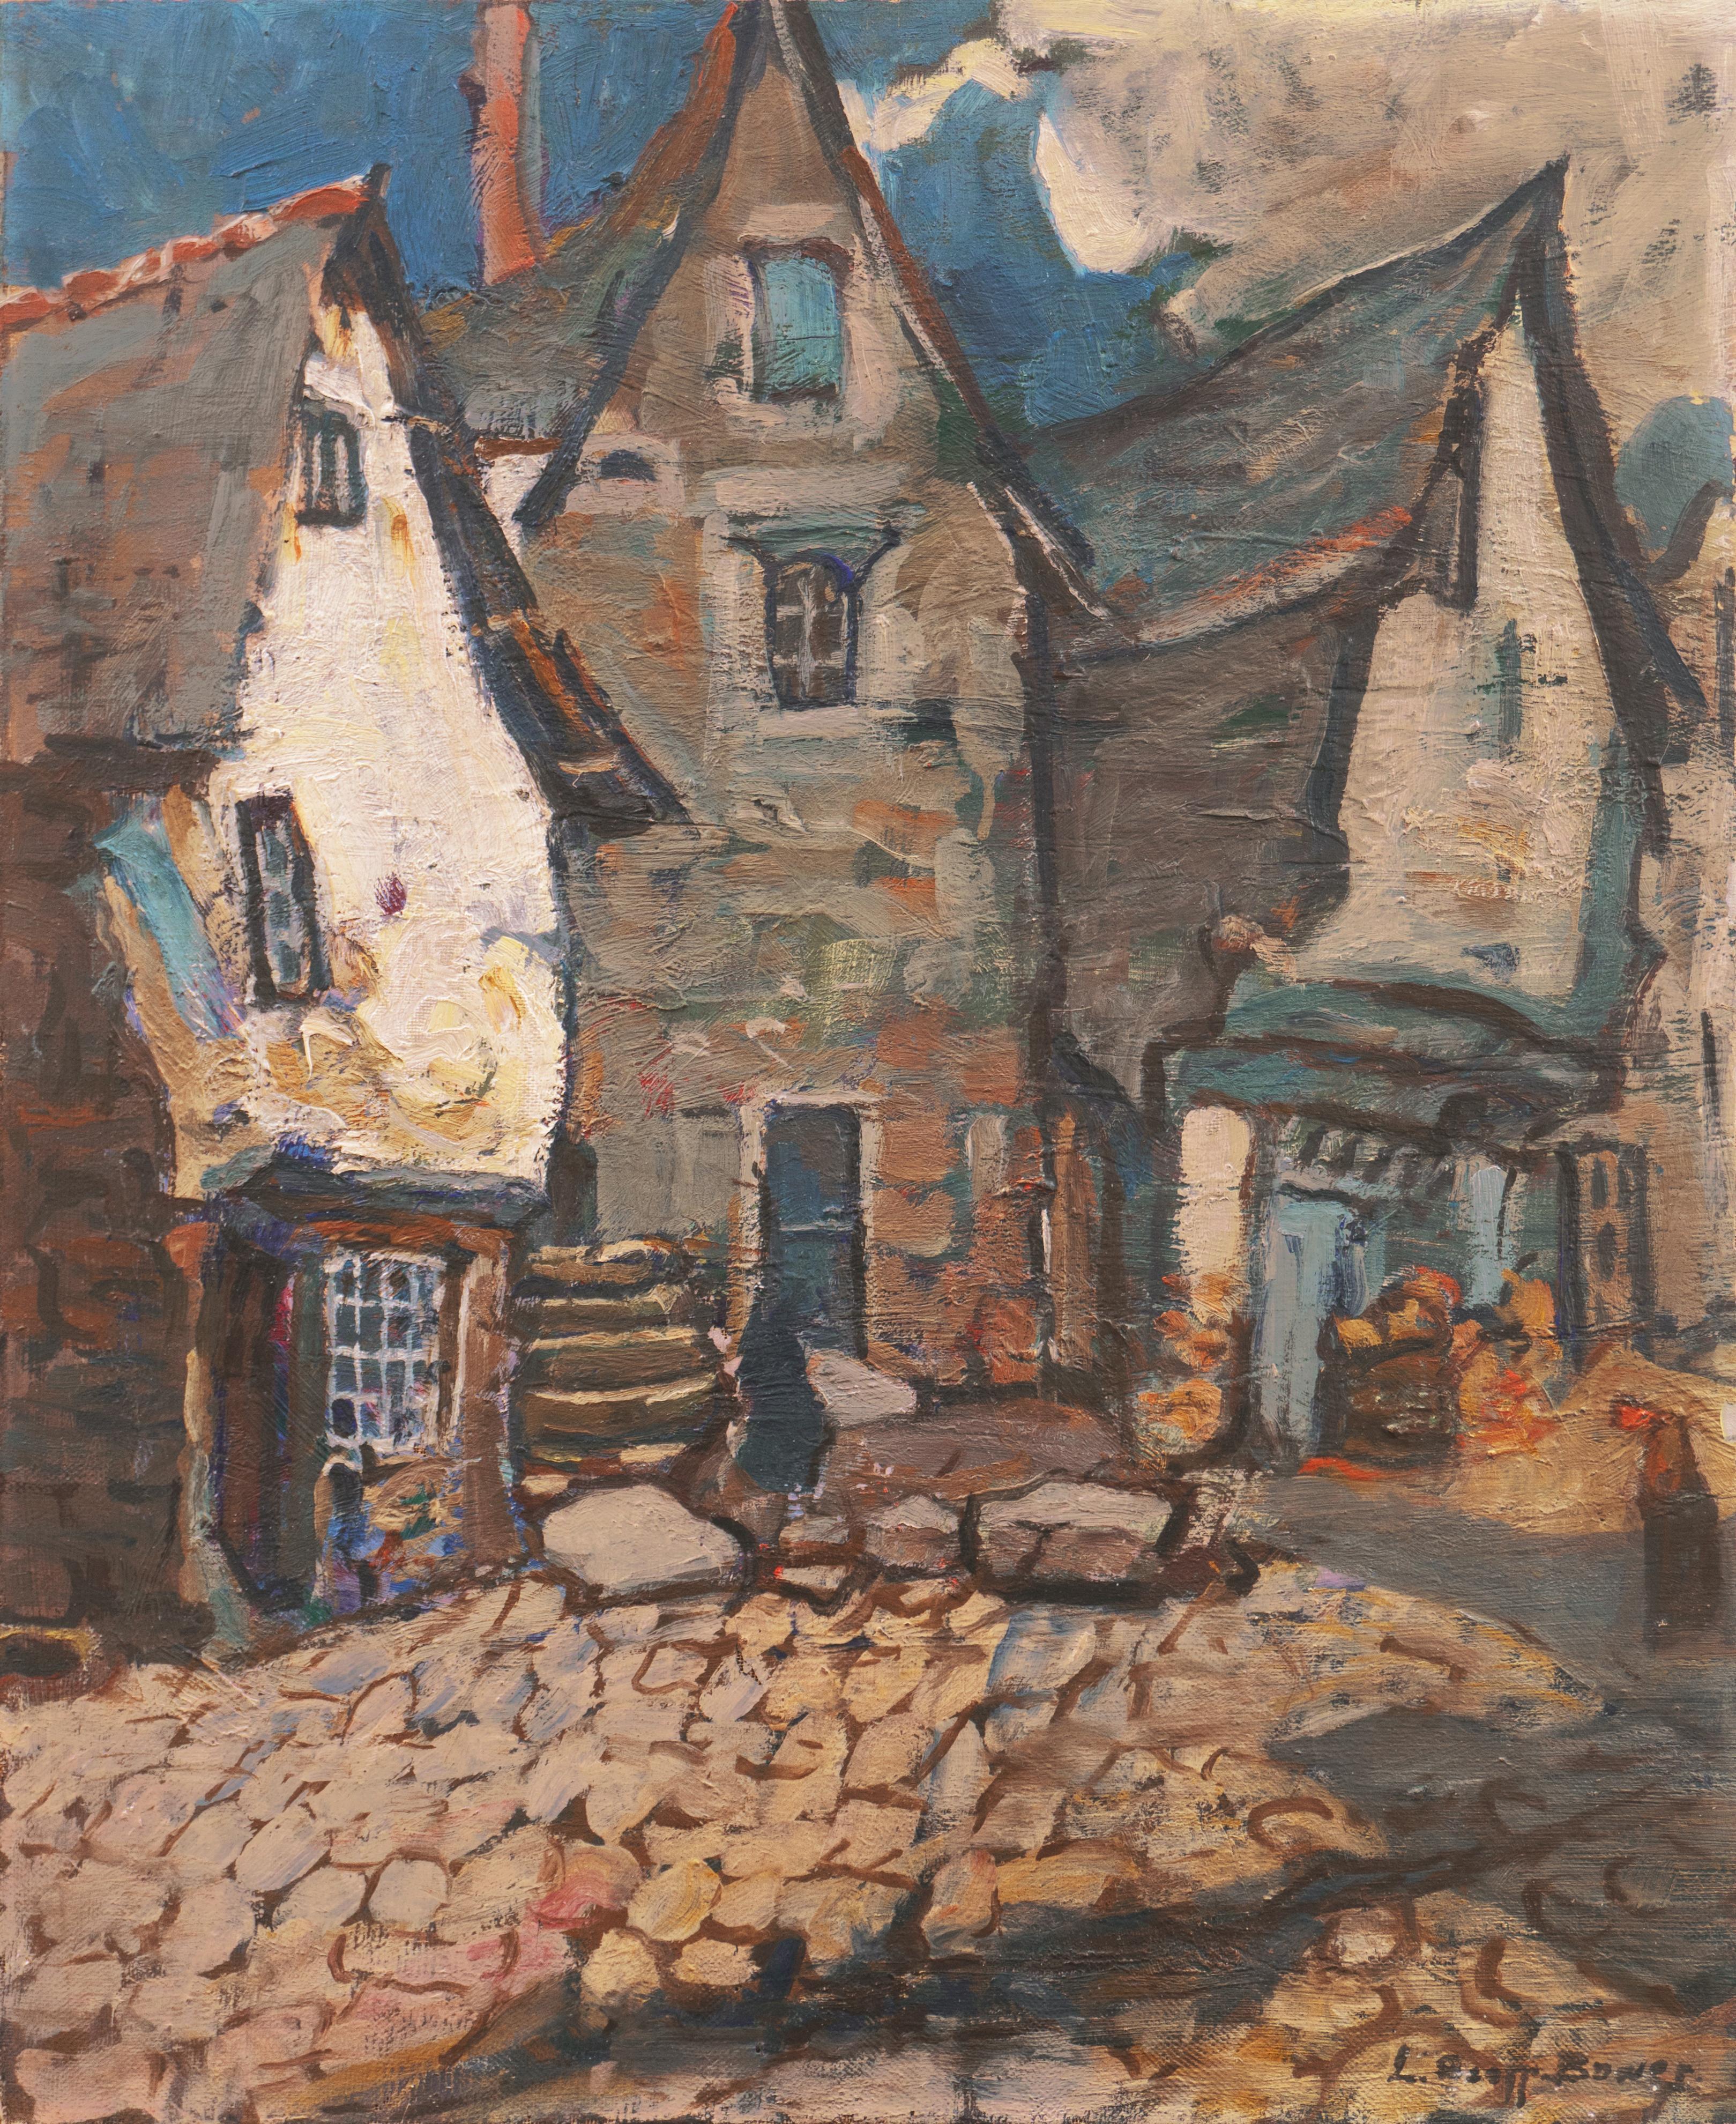 'Dinan, Brittany', Woman Artist, Academie Julian, Paris Salon, PAFA, Benezit